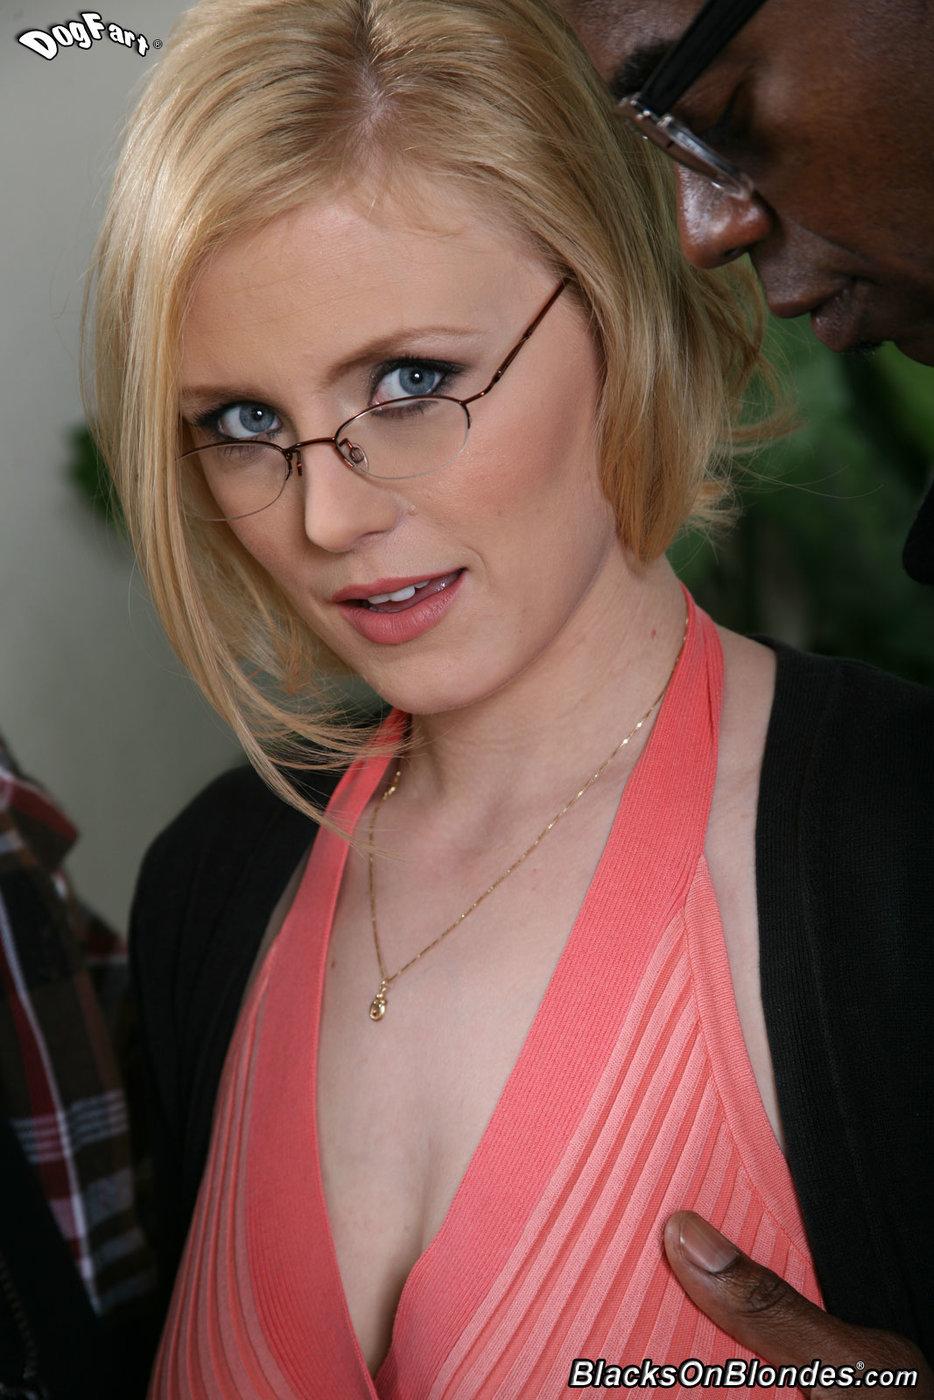 Pov Blonde Short Hair Amateur